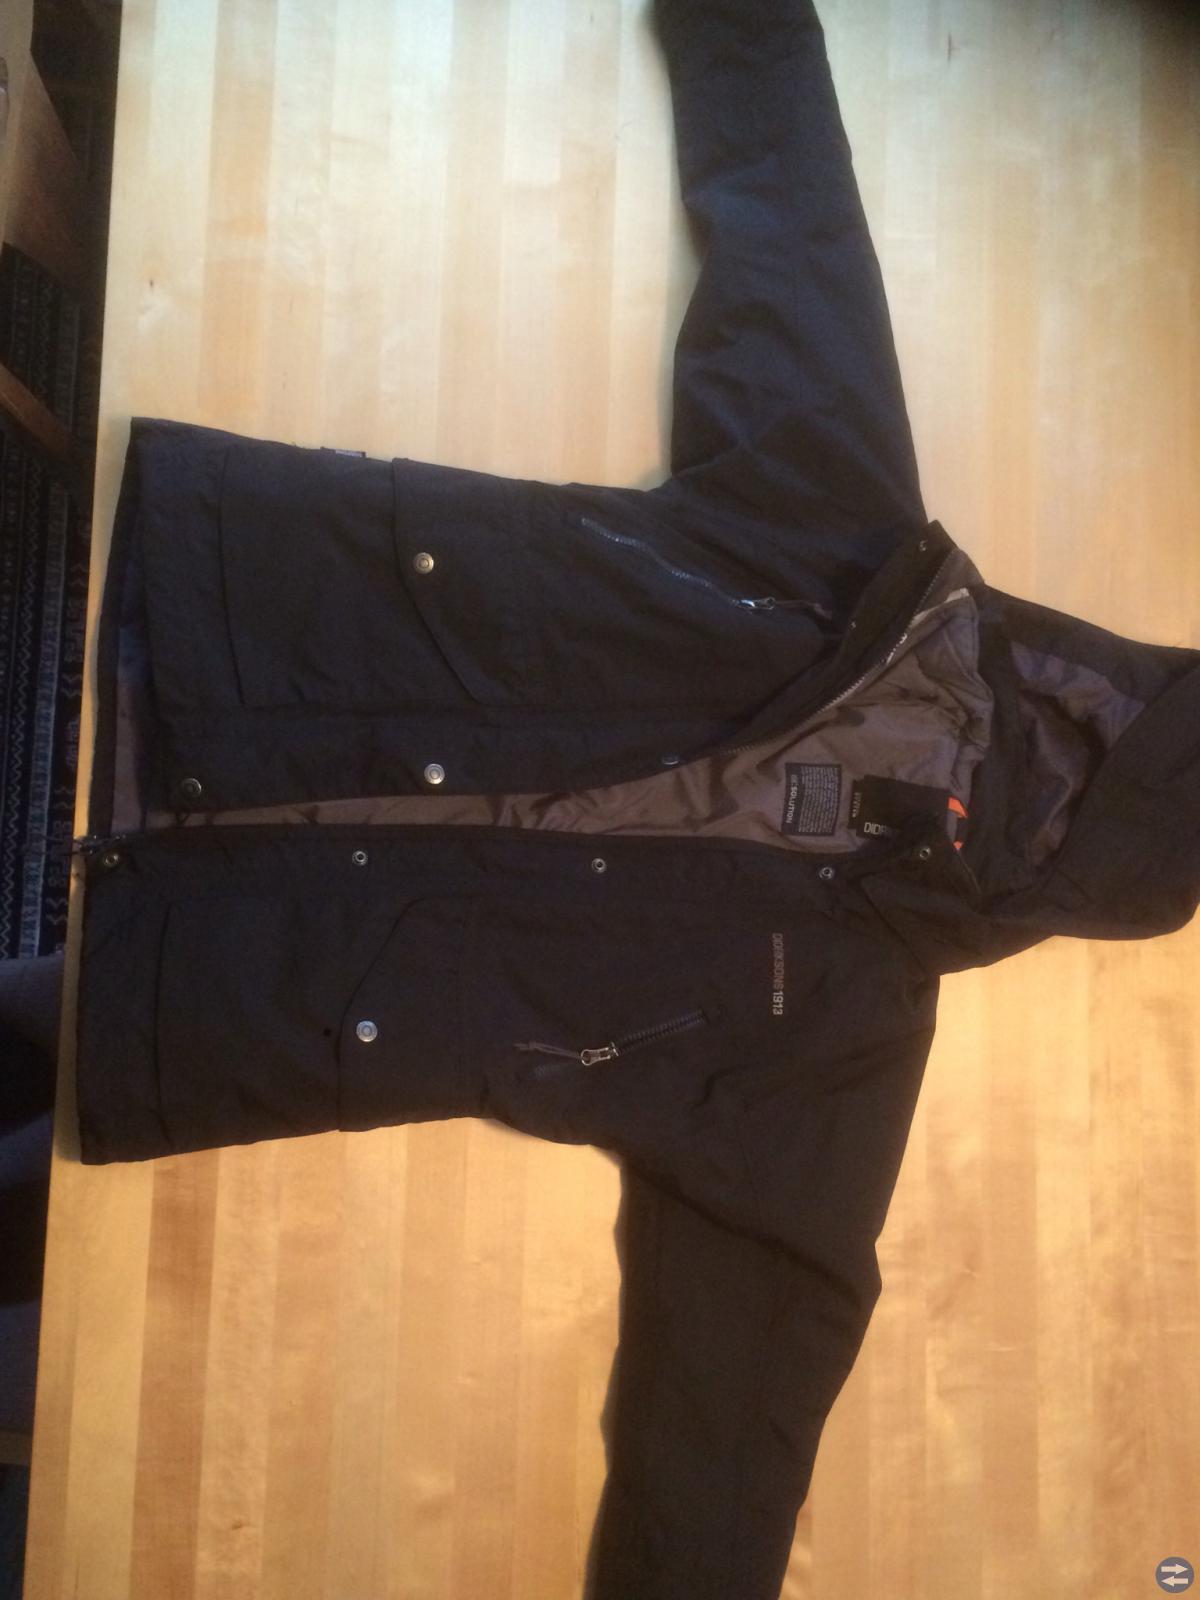 Didrikson vinterjacka (skaljacka) svart stl 160